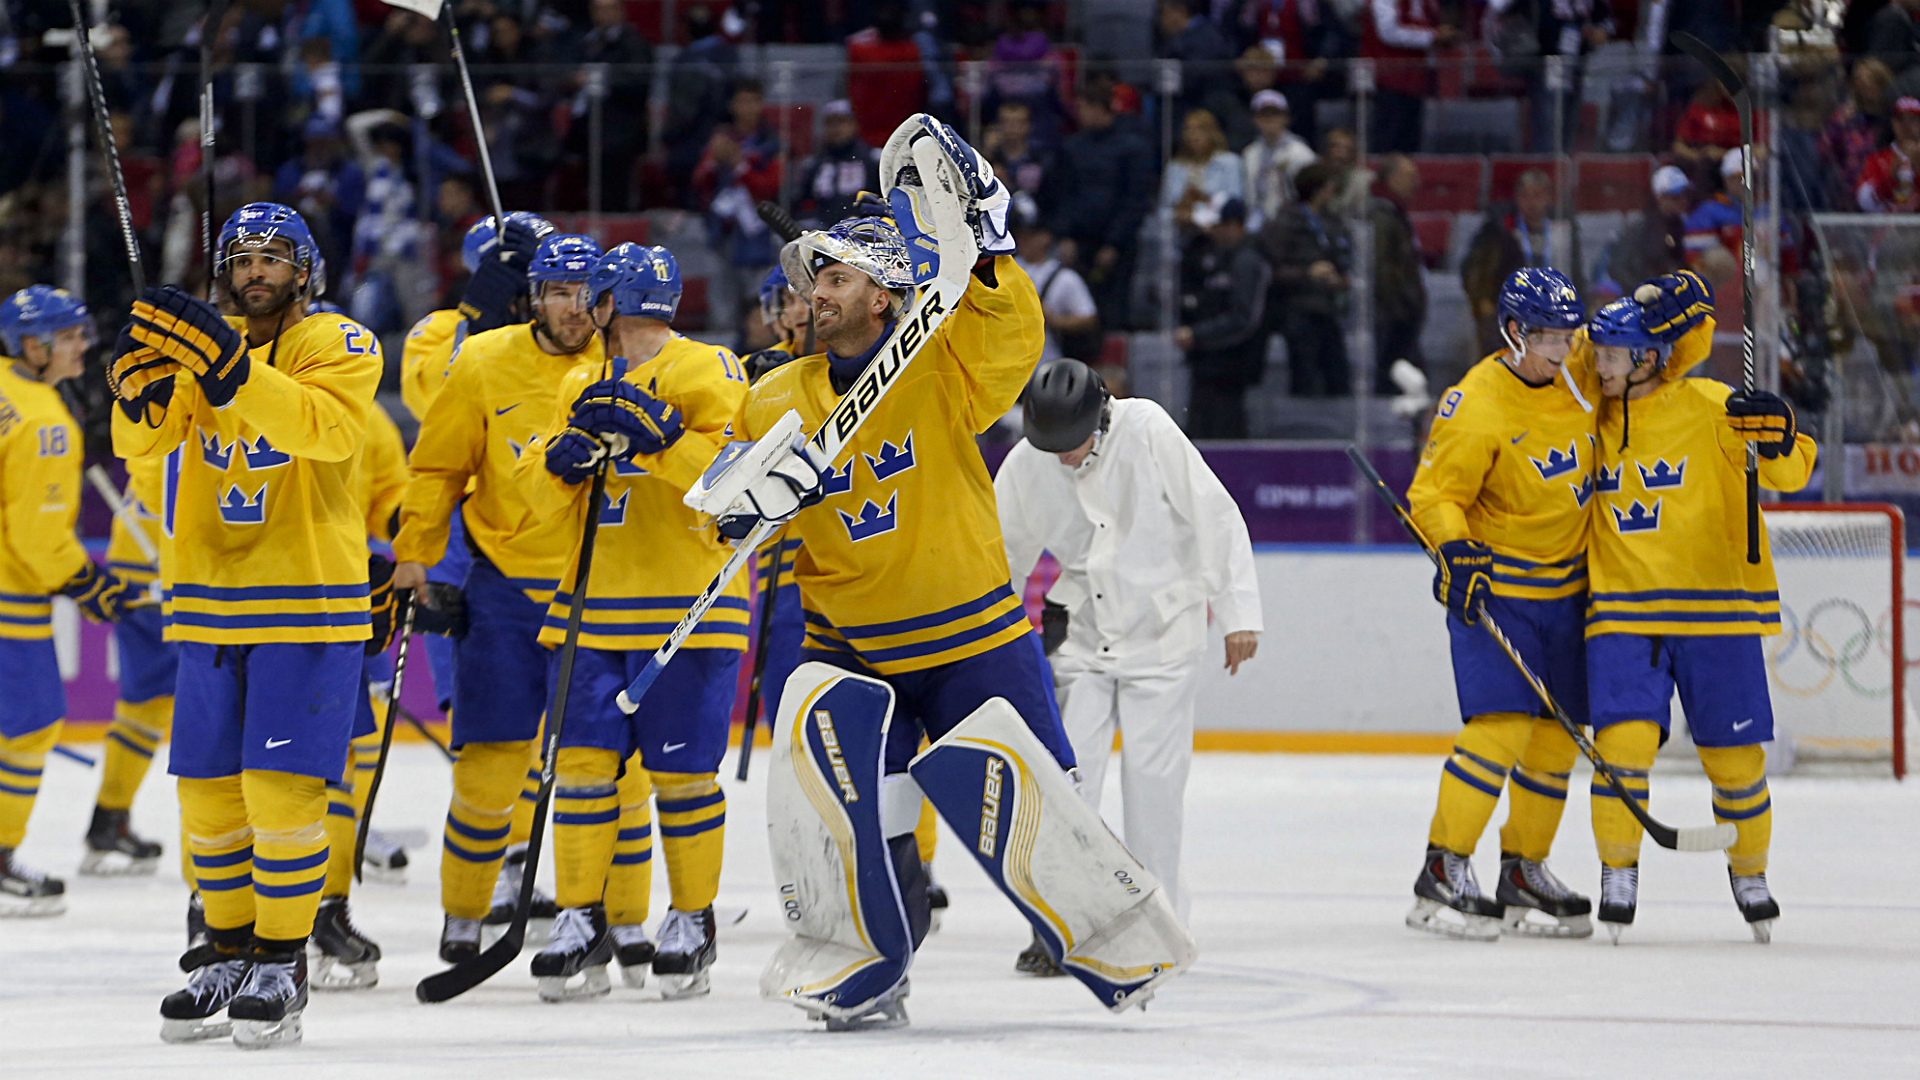 team-sweden-02-21-14-AP-FTR